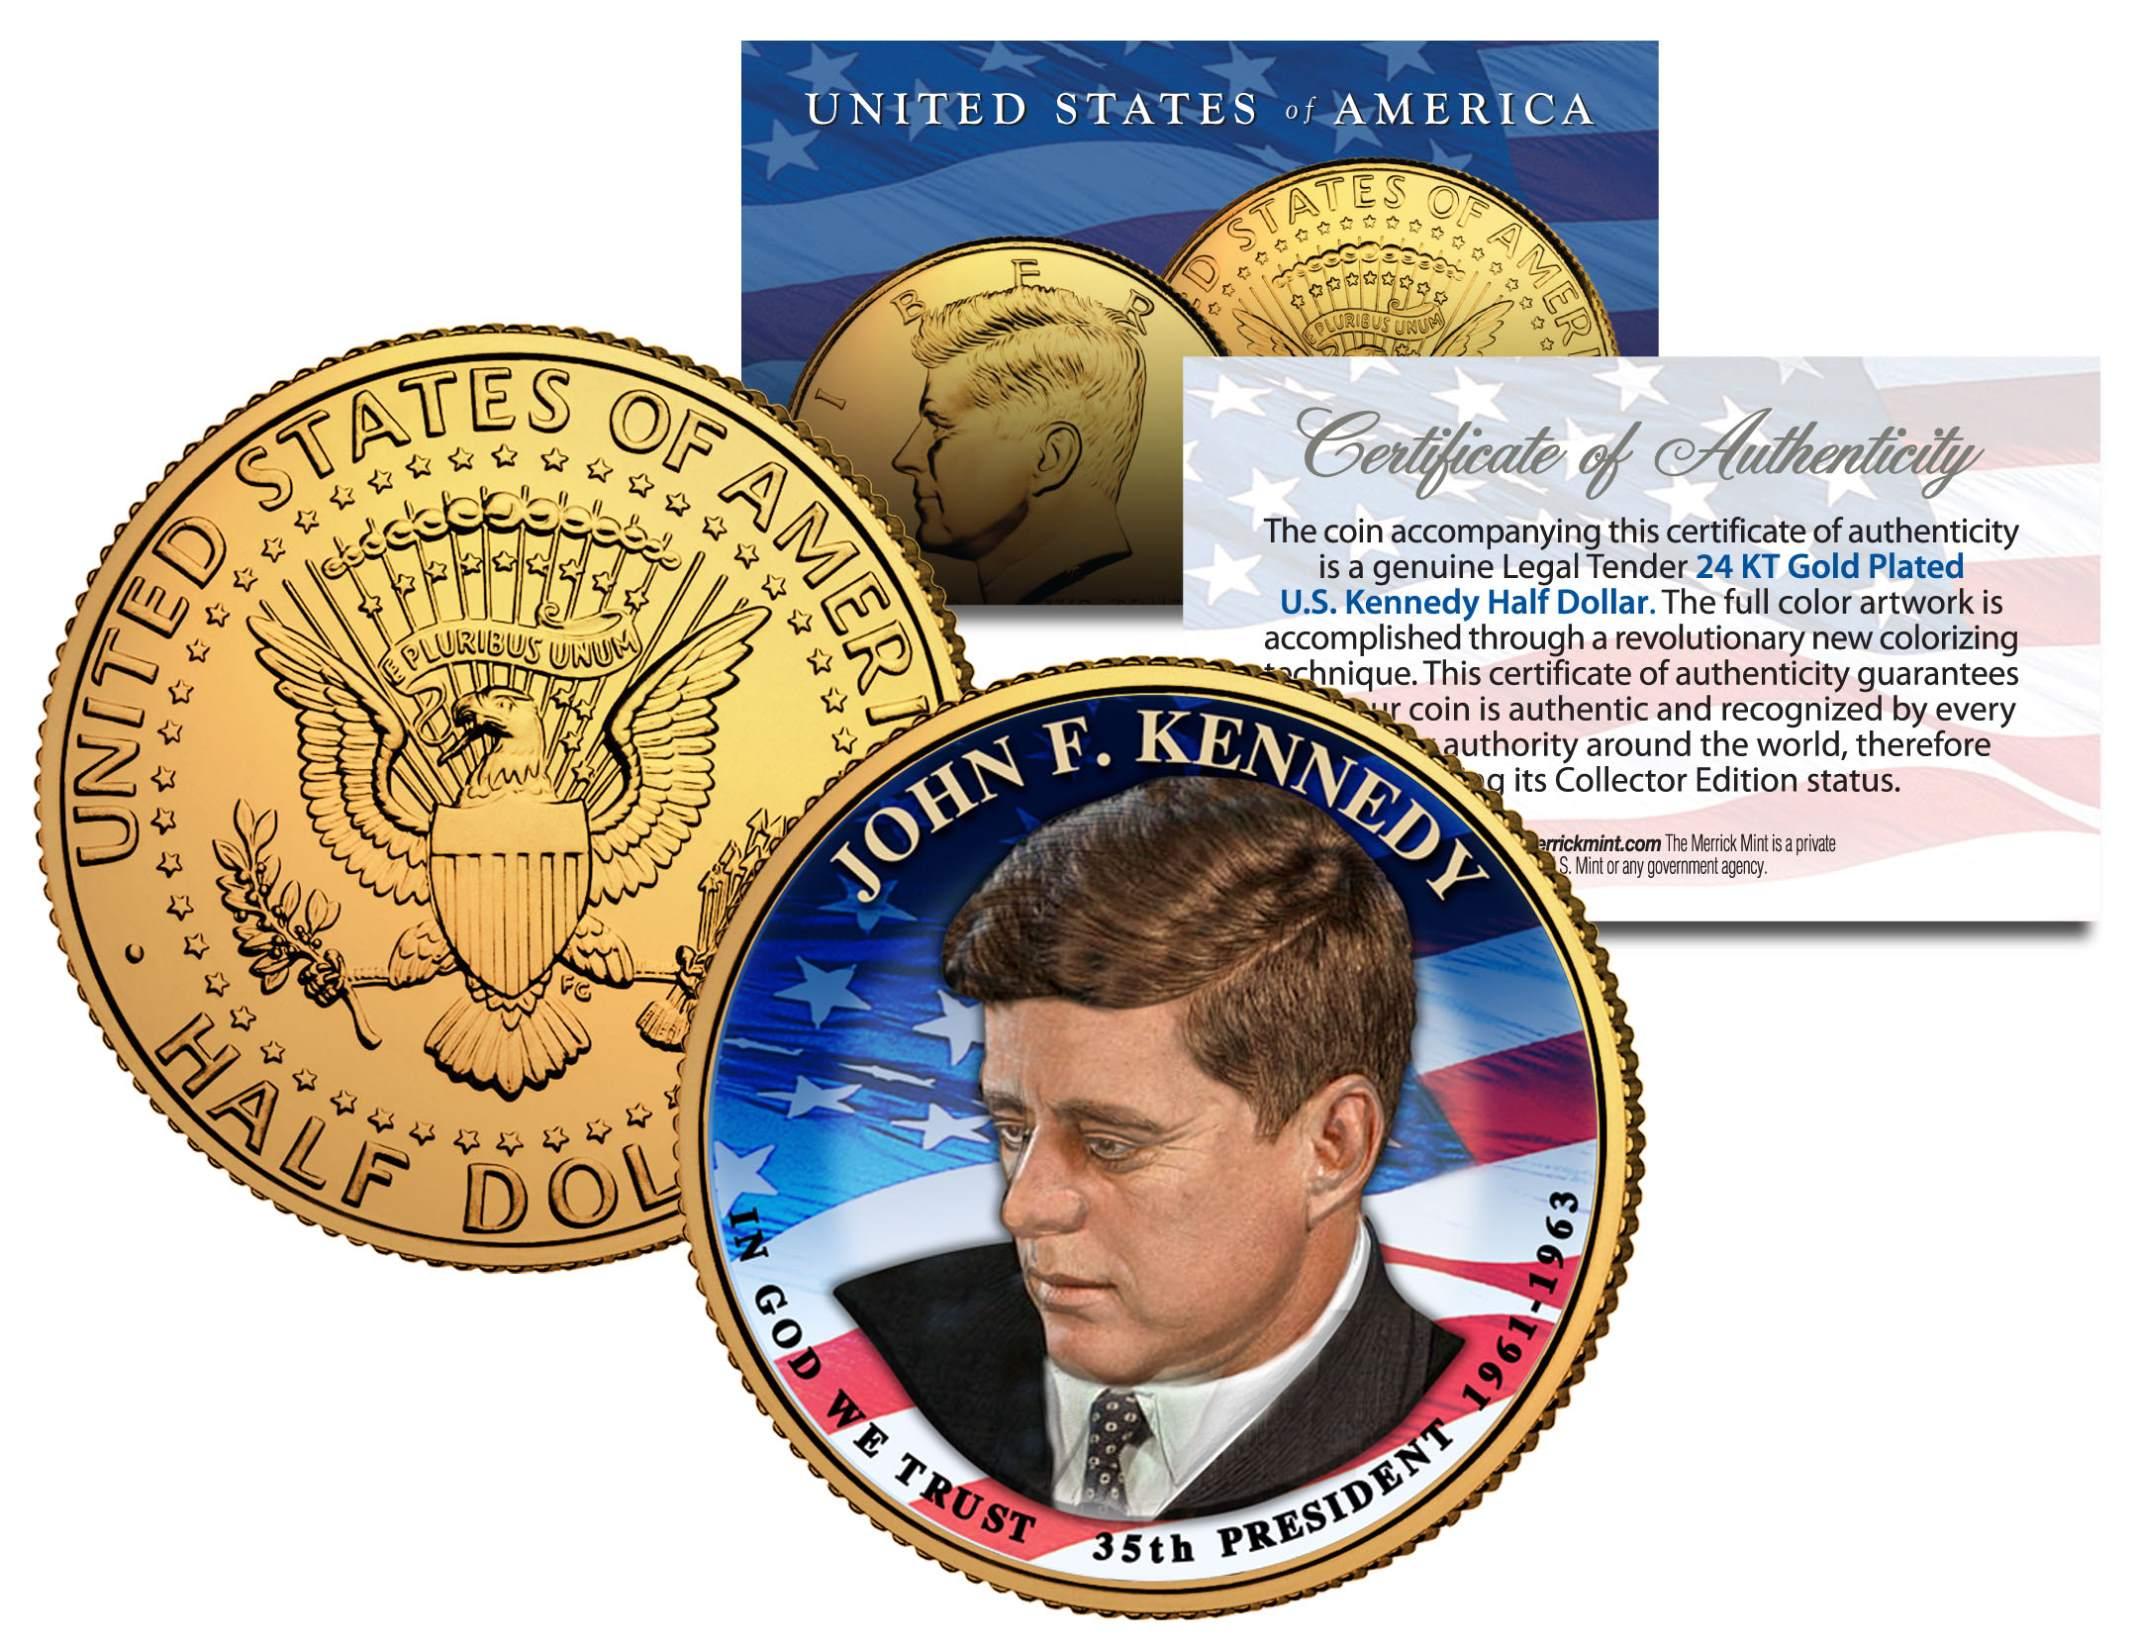 Presidential 1 John F Kennedy On 2015 Jfk Half Dollar U S